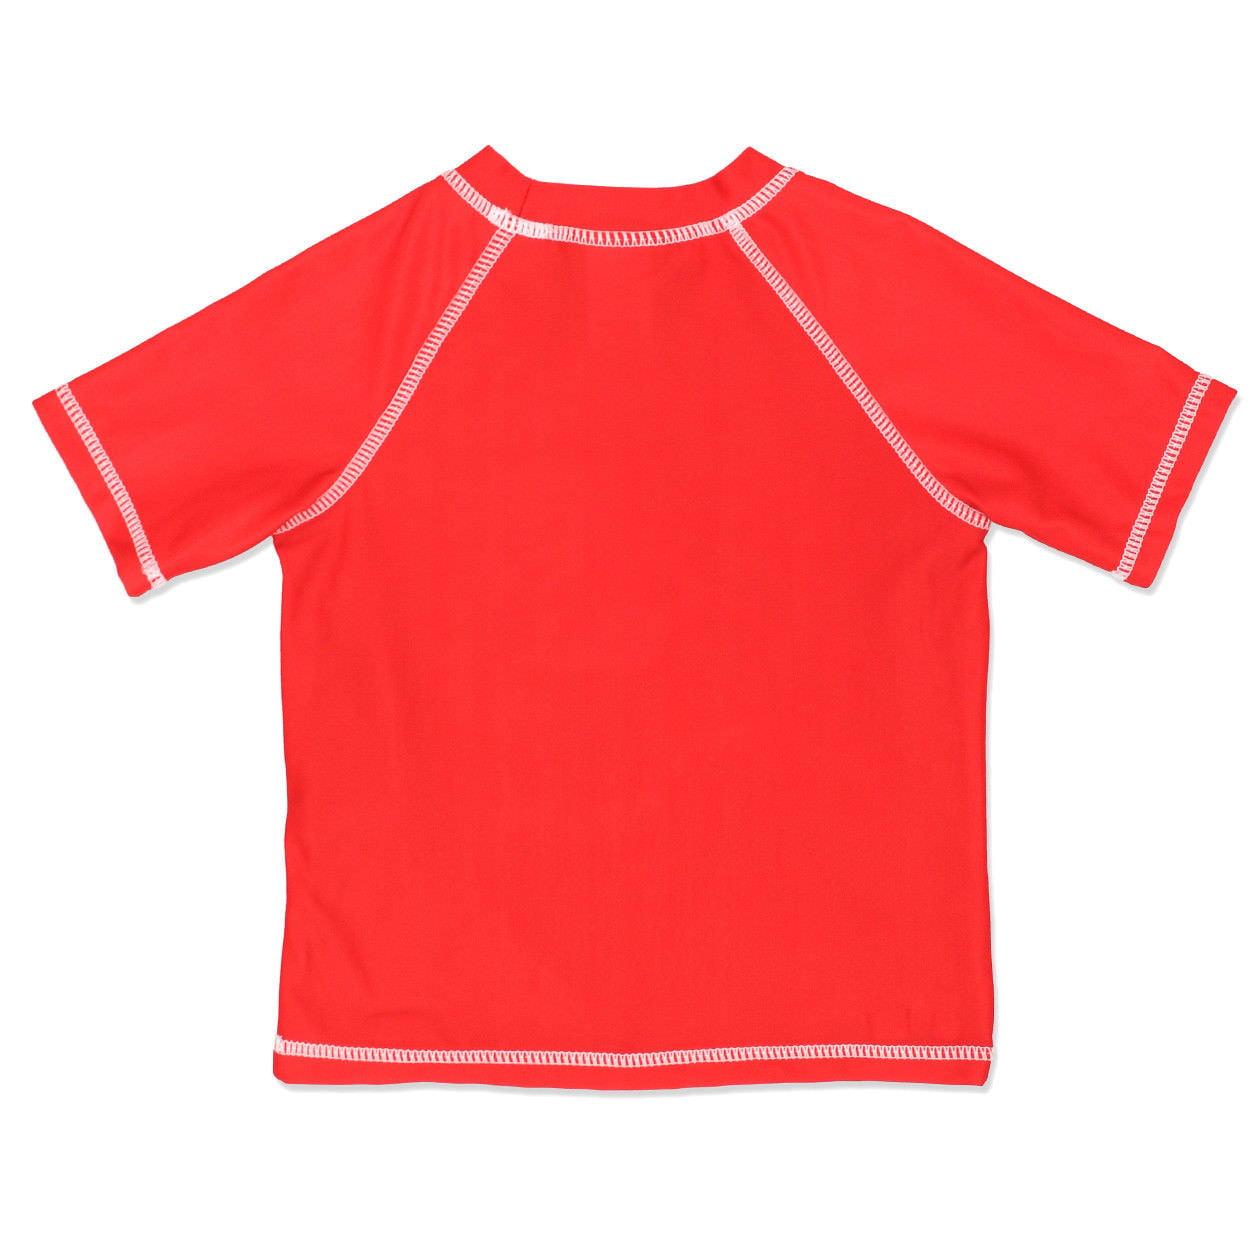 PJ Masks Little Boys Toddler Rash Guard and Swim Trunks Set